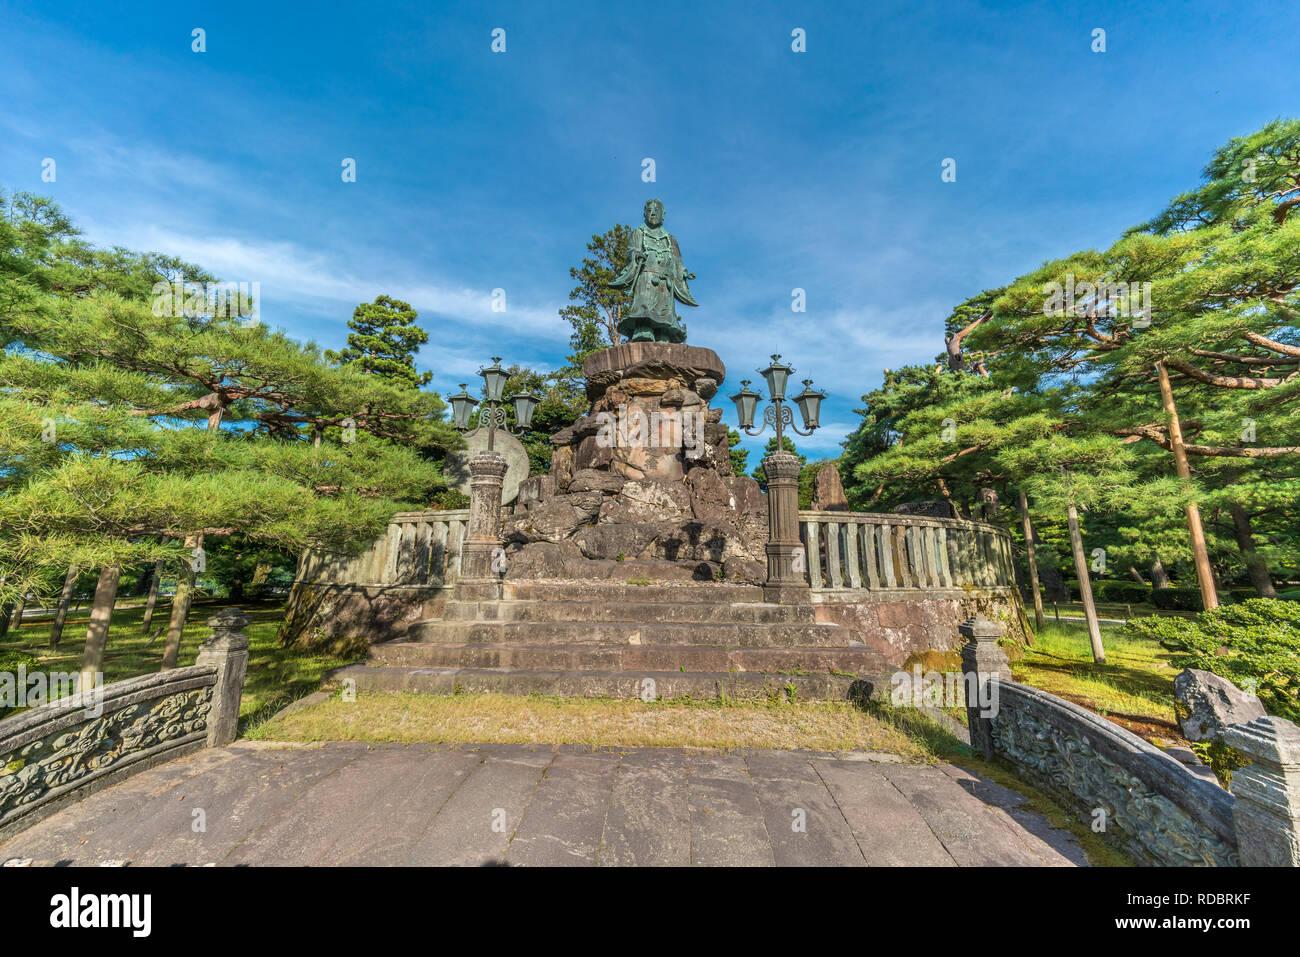 Kanazawa, Ishikawa Japan - August 22, 2018 : Statue of Prince Yamato Takeru. 12th Emperor of Japan Located in Kenrokuen Garden - Stock Image